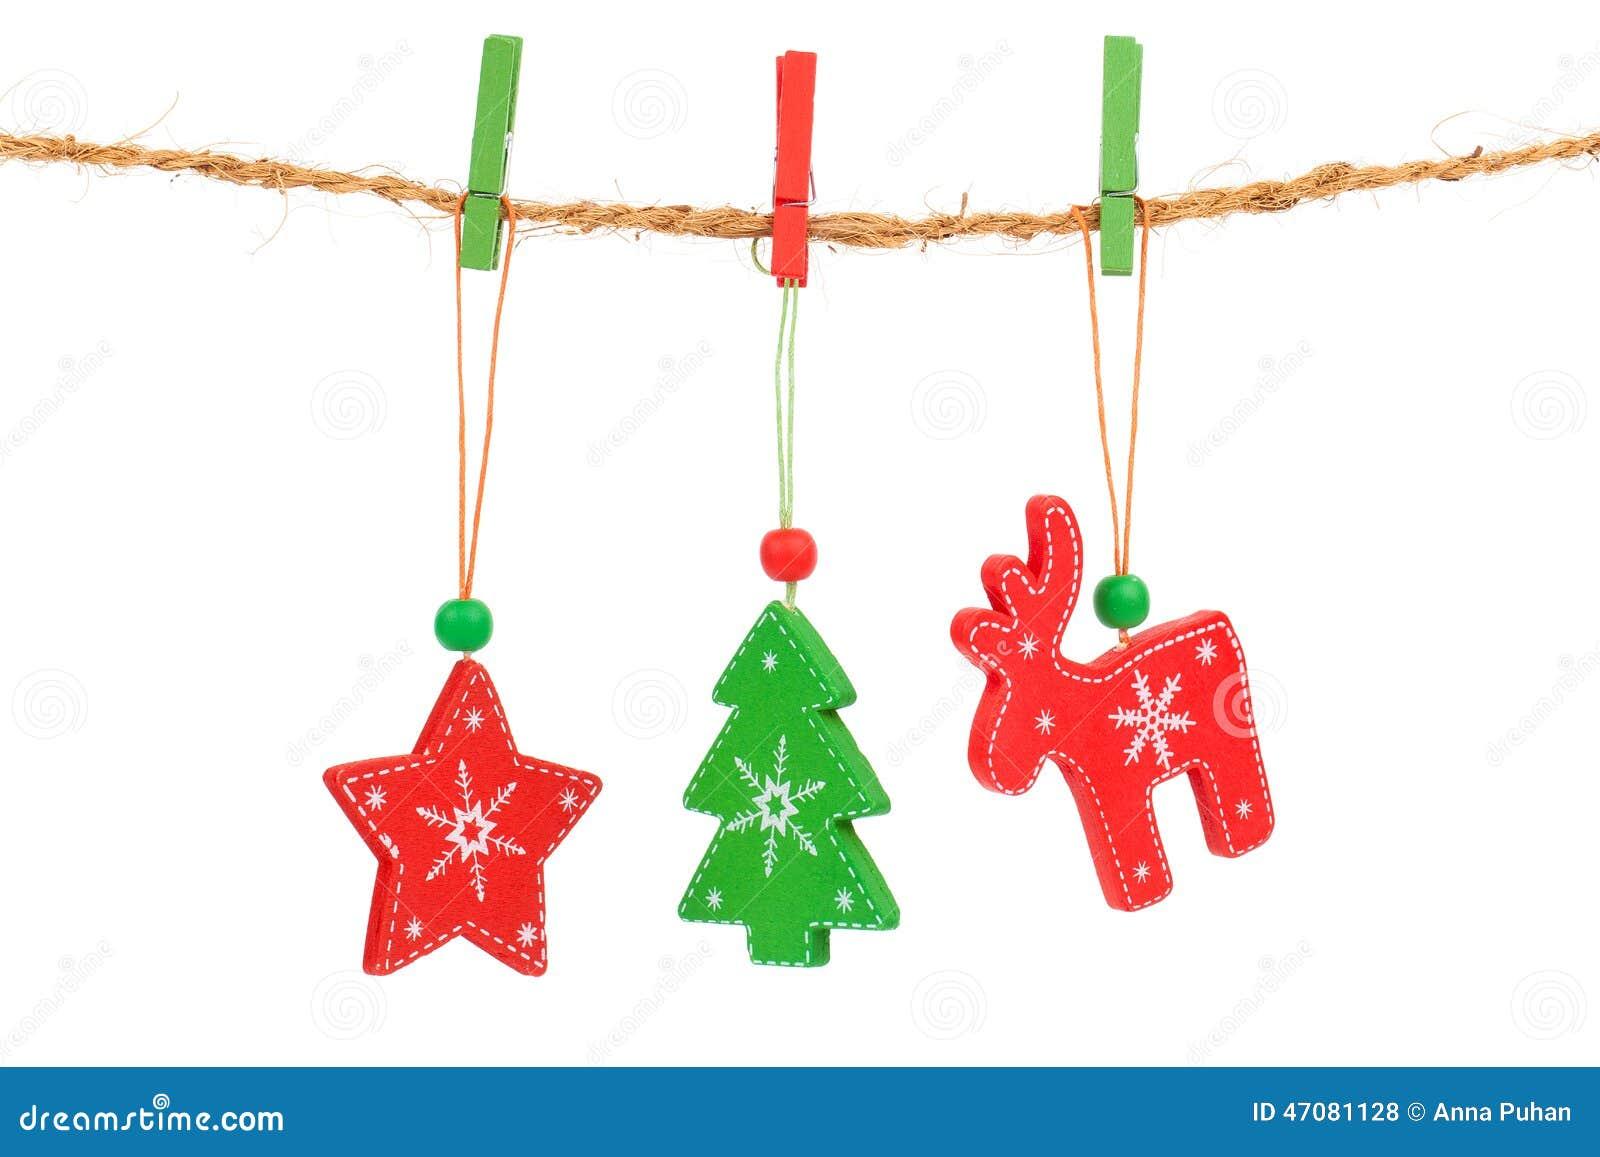 Hanging Decorations Stock Image 3474295